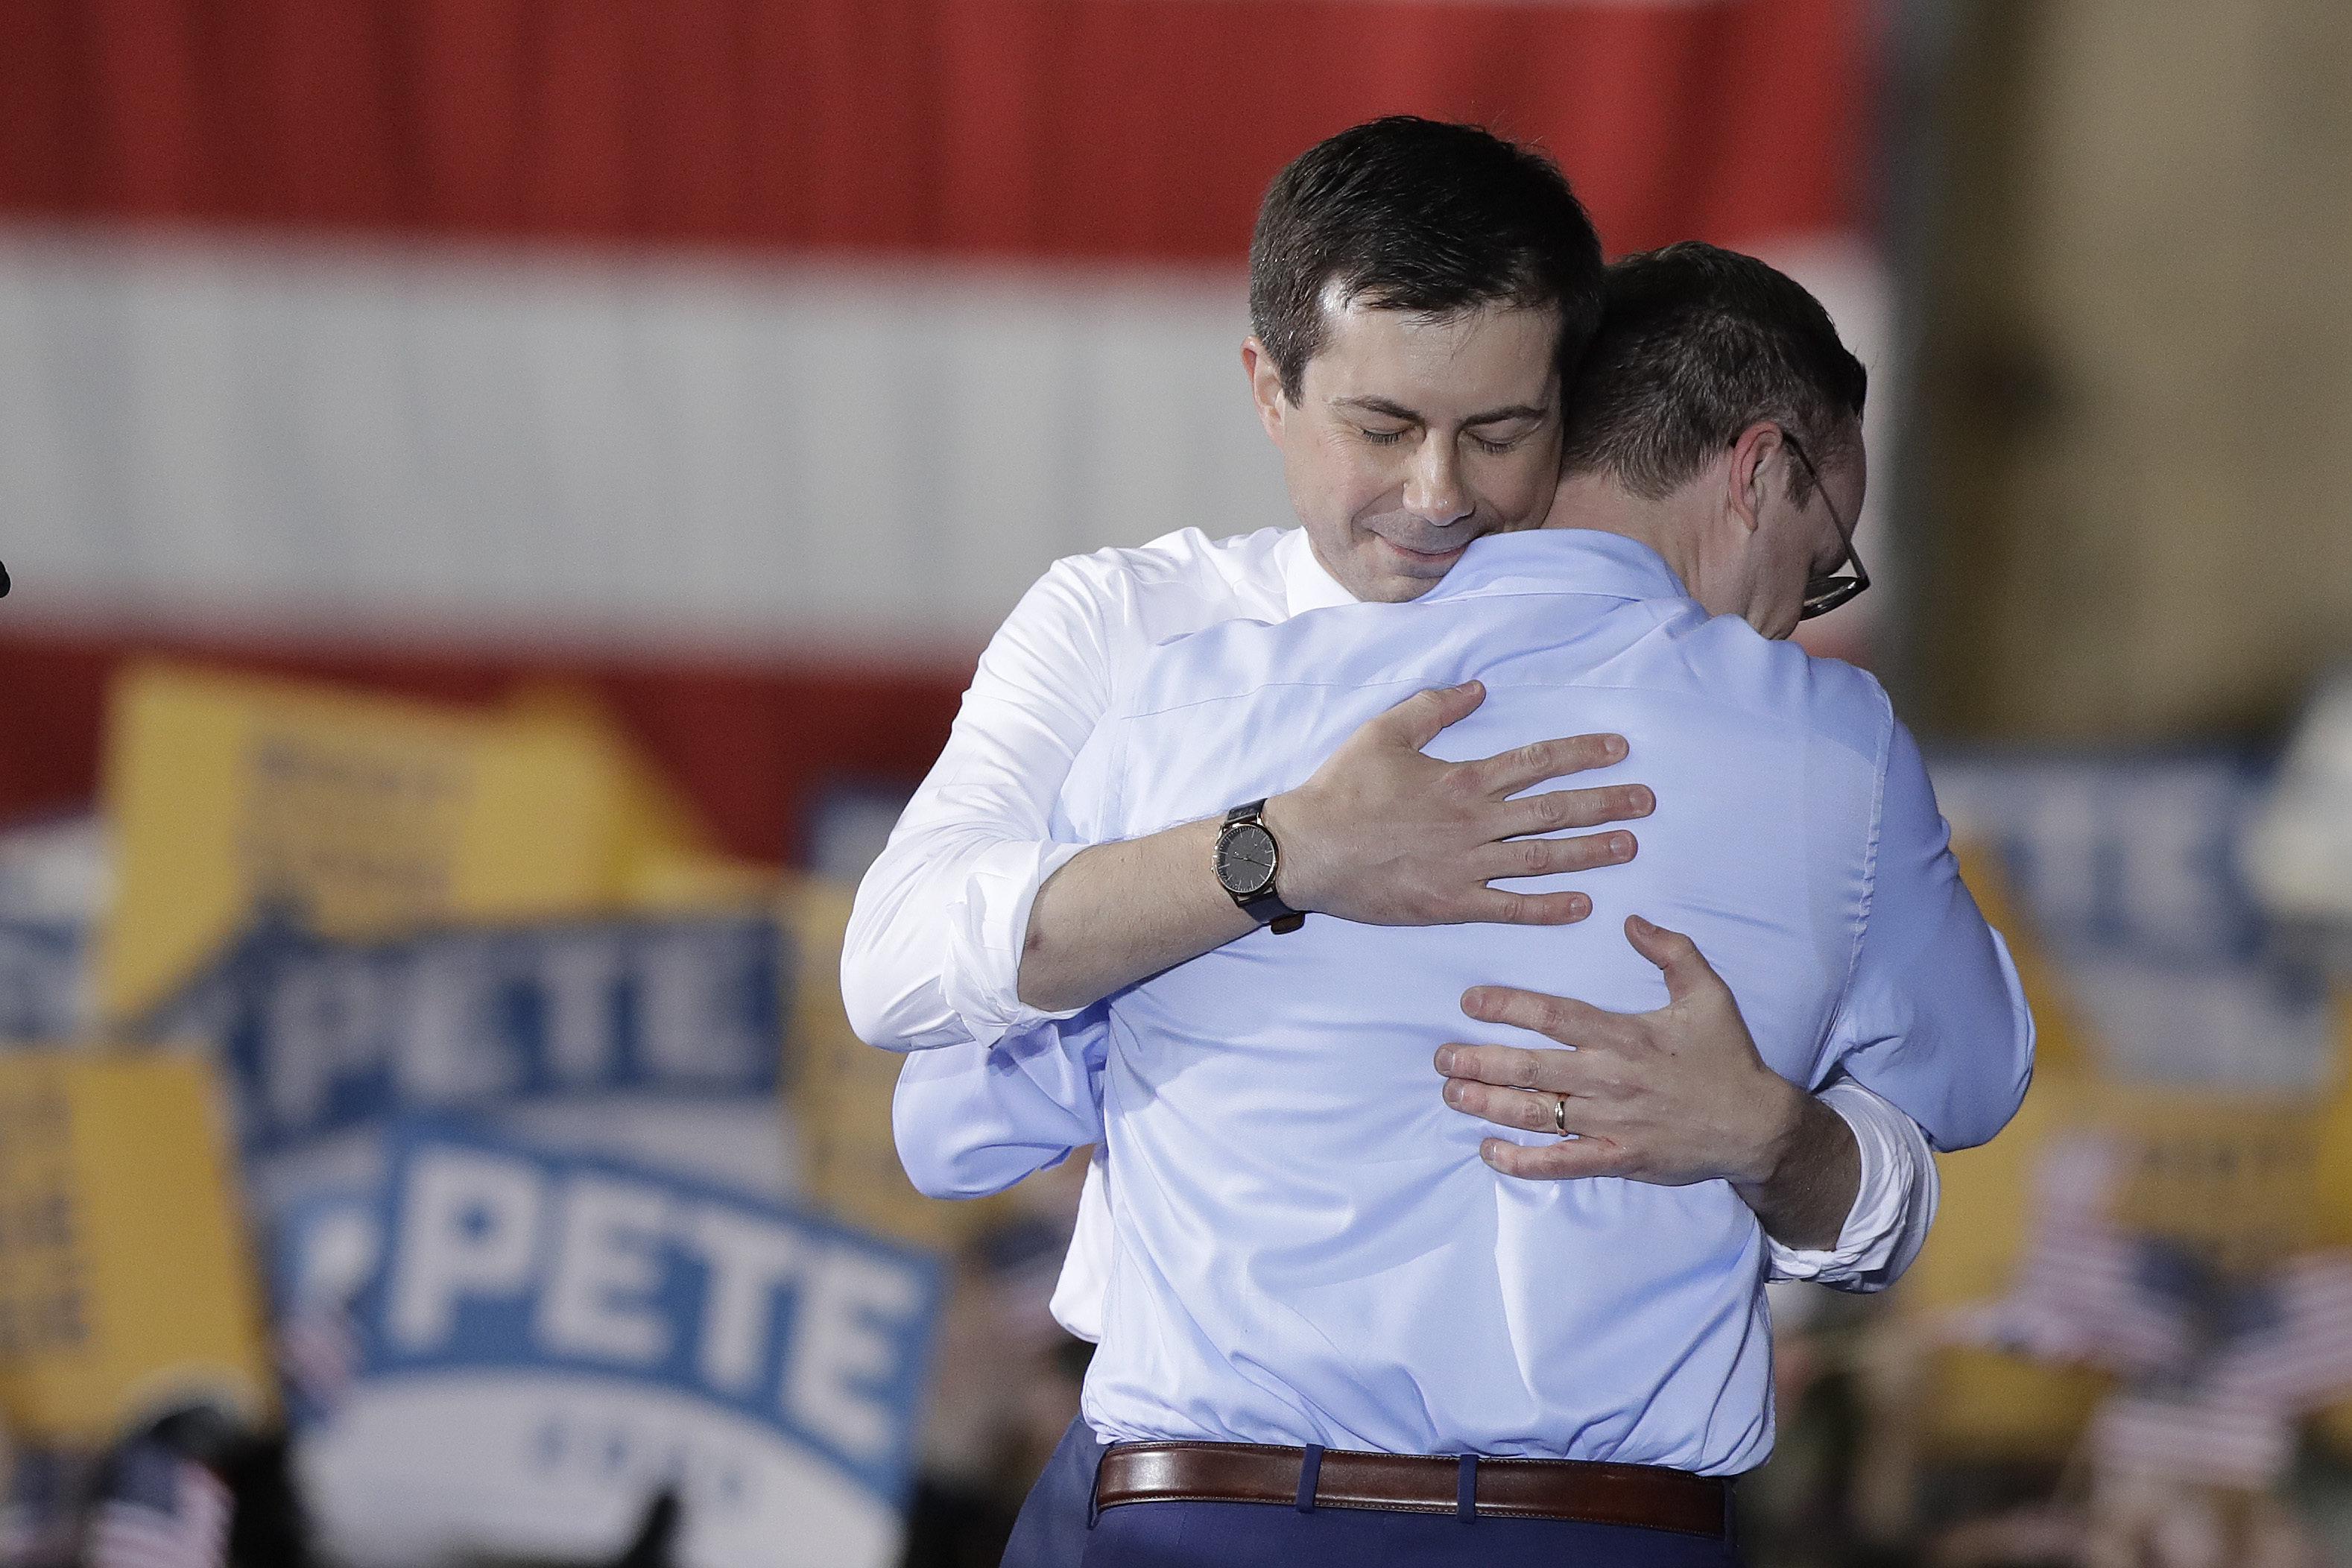 Joven, alcalde, exmilitar, gay: Pete Buttigieg, el demócrata que reclama un relevo generacional para derrotar a